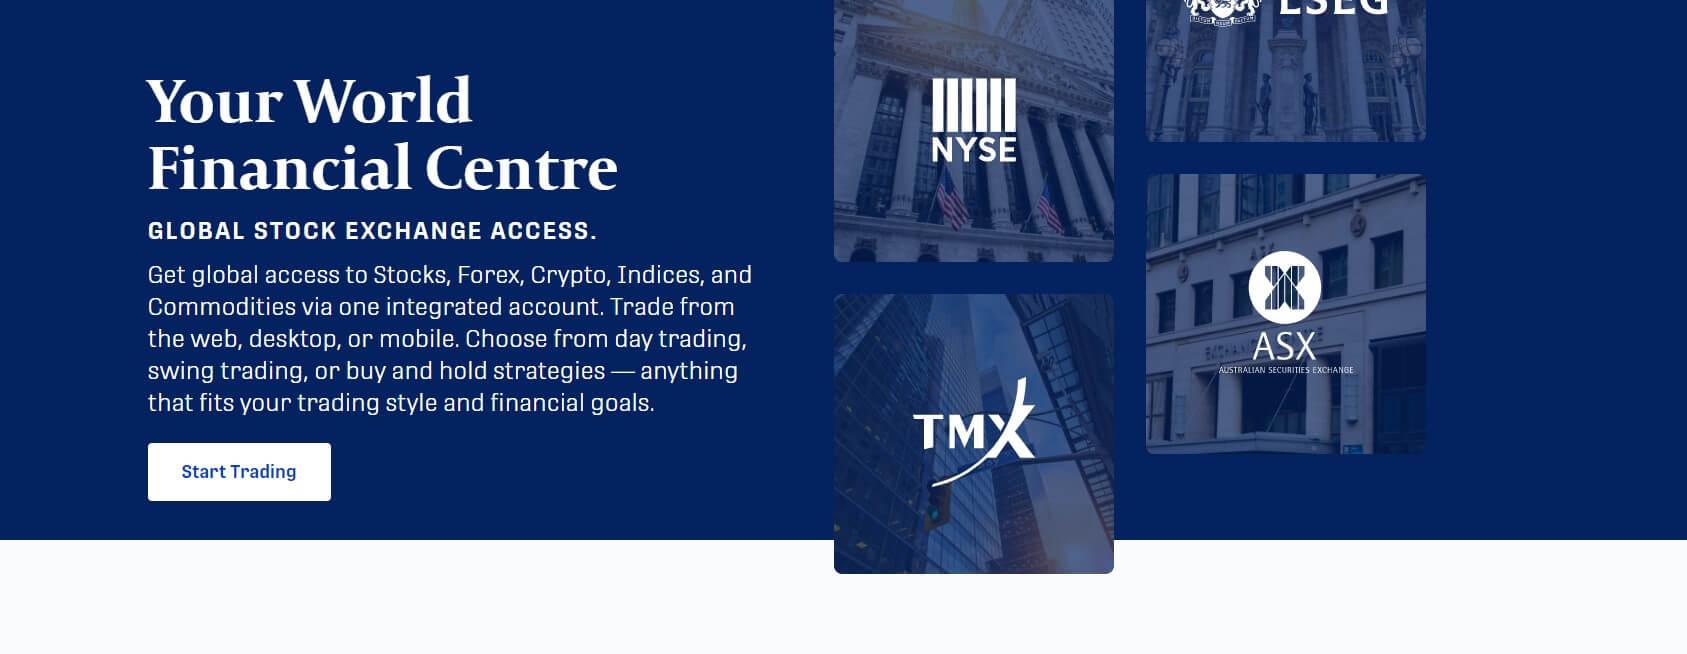 FinancialCentre review, FinancialCentre Review